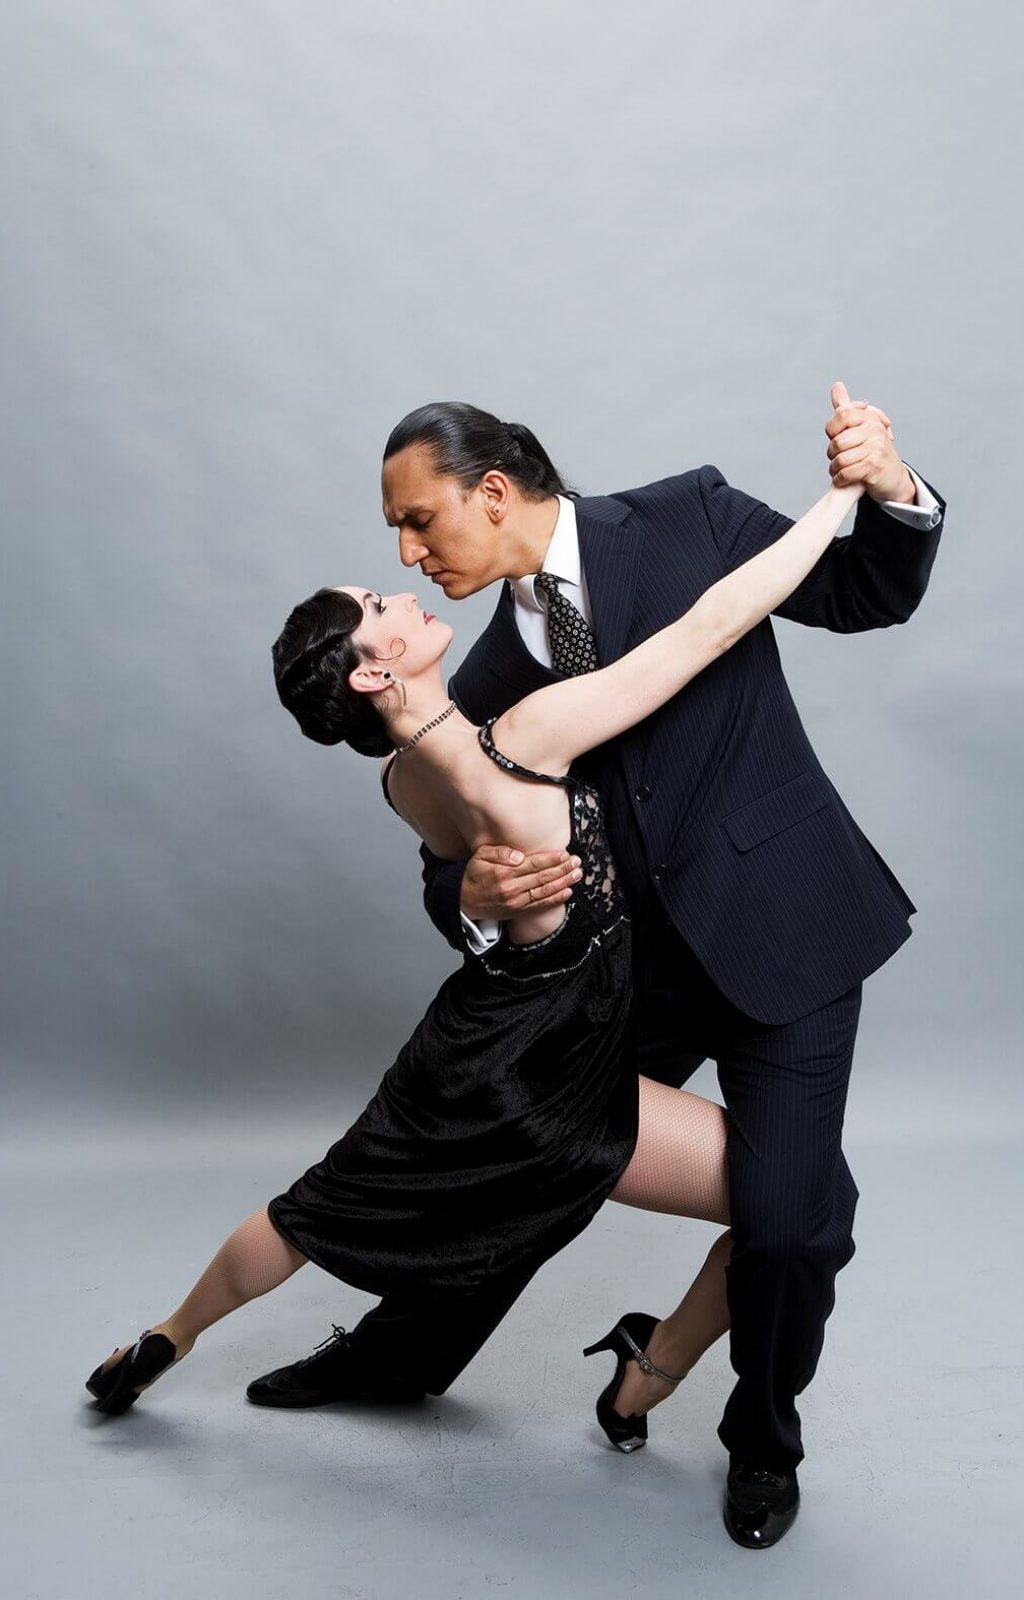 Gerardo Bailando tango charock